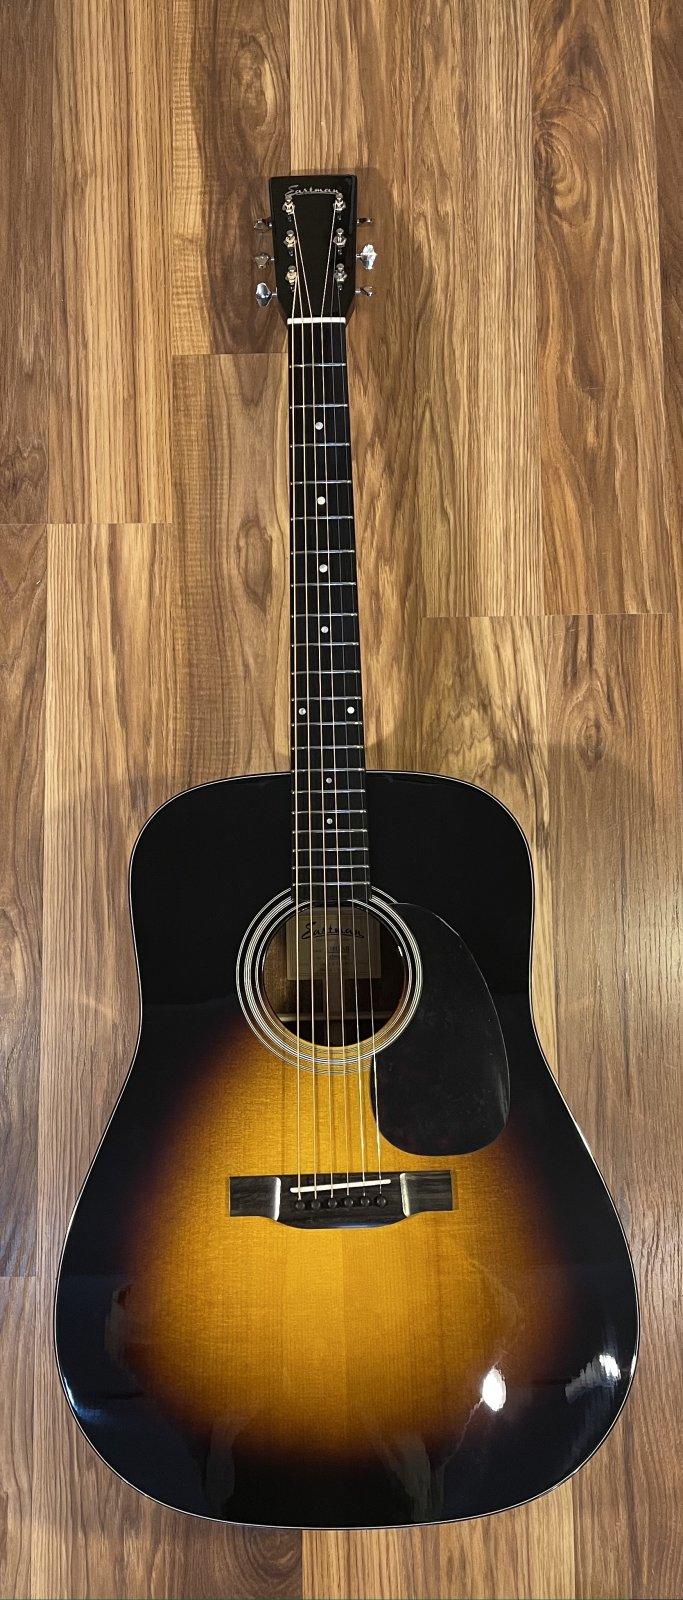 Eastman E10D-SB Acoustic Guitar